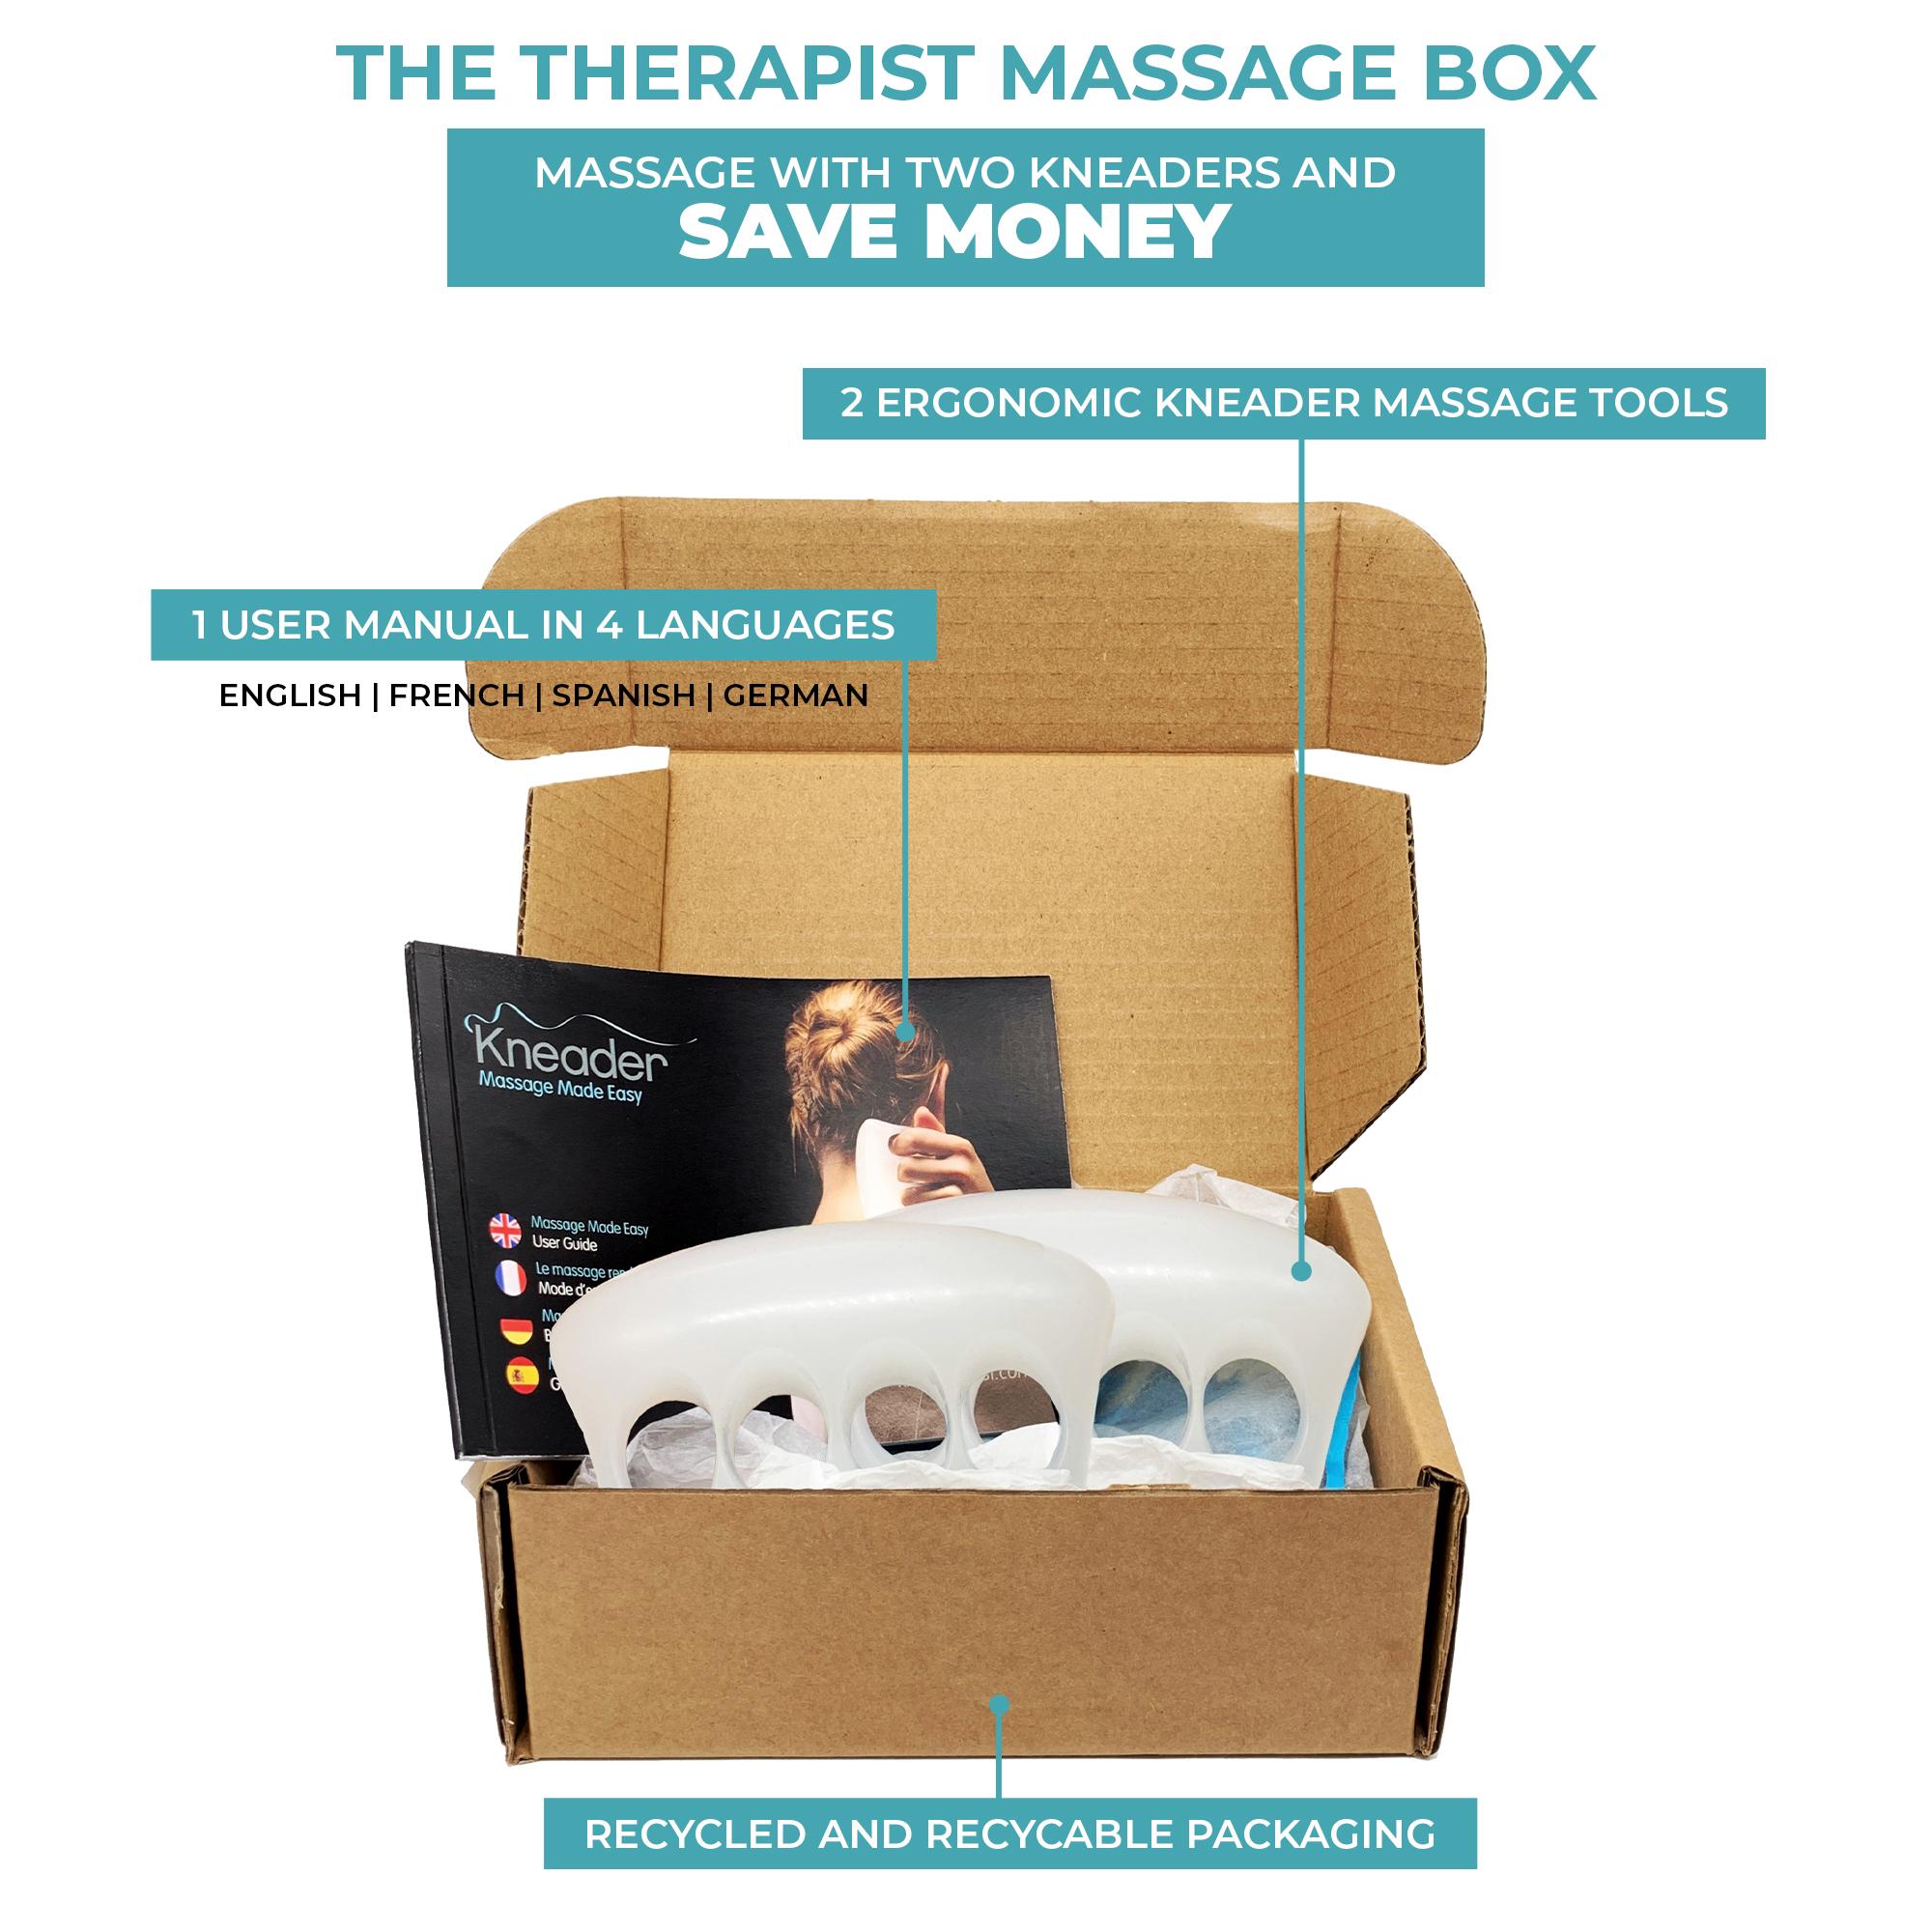 The Kneader Massage Tool